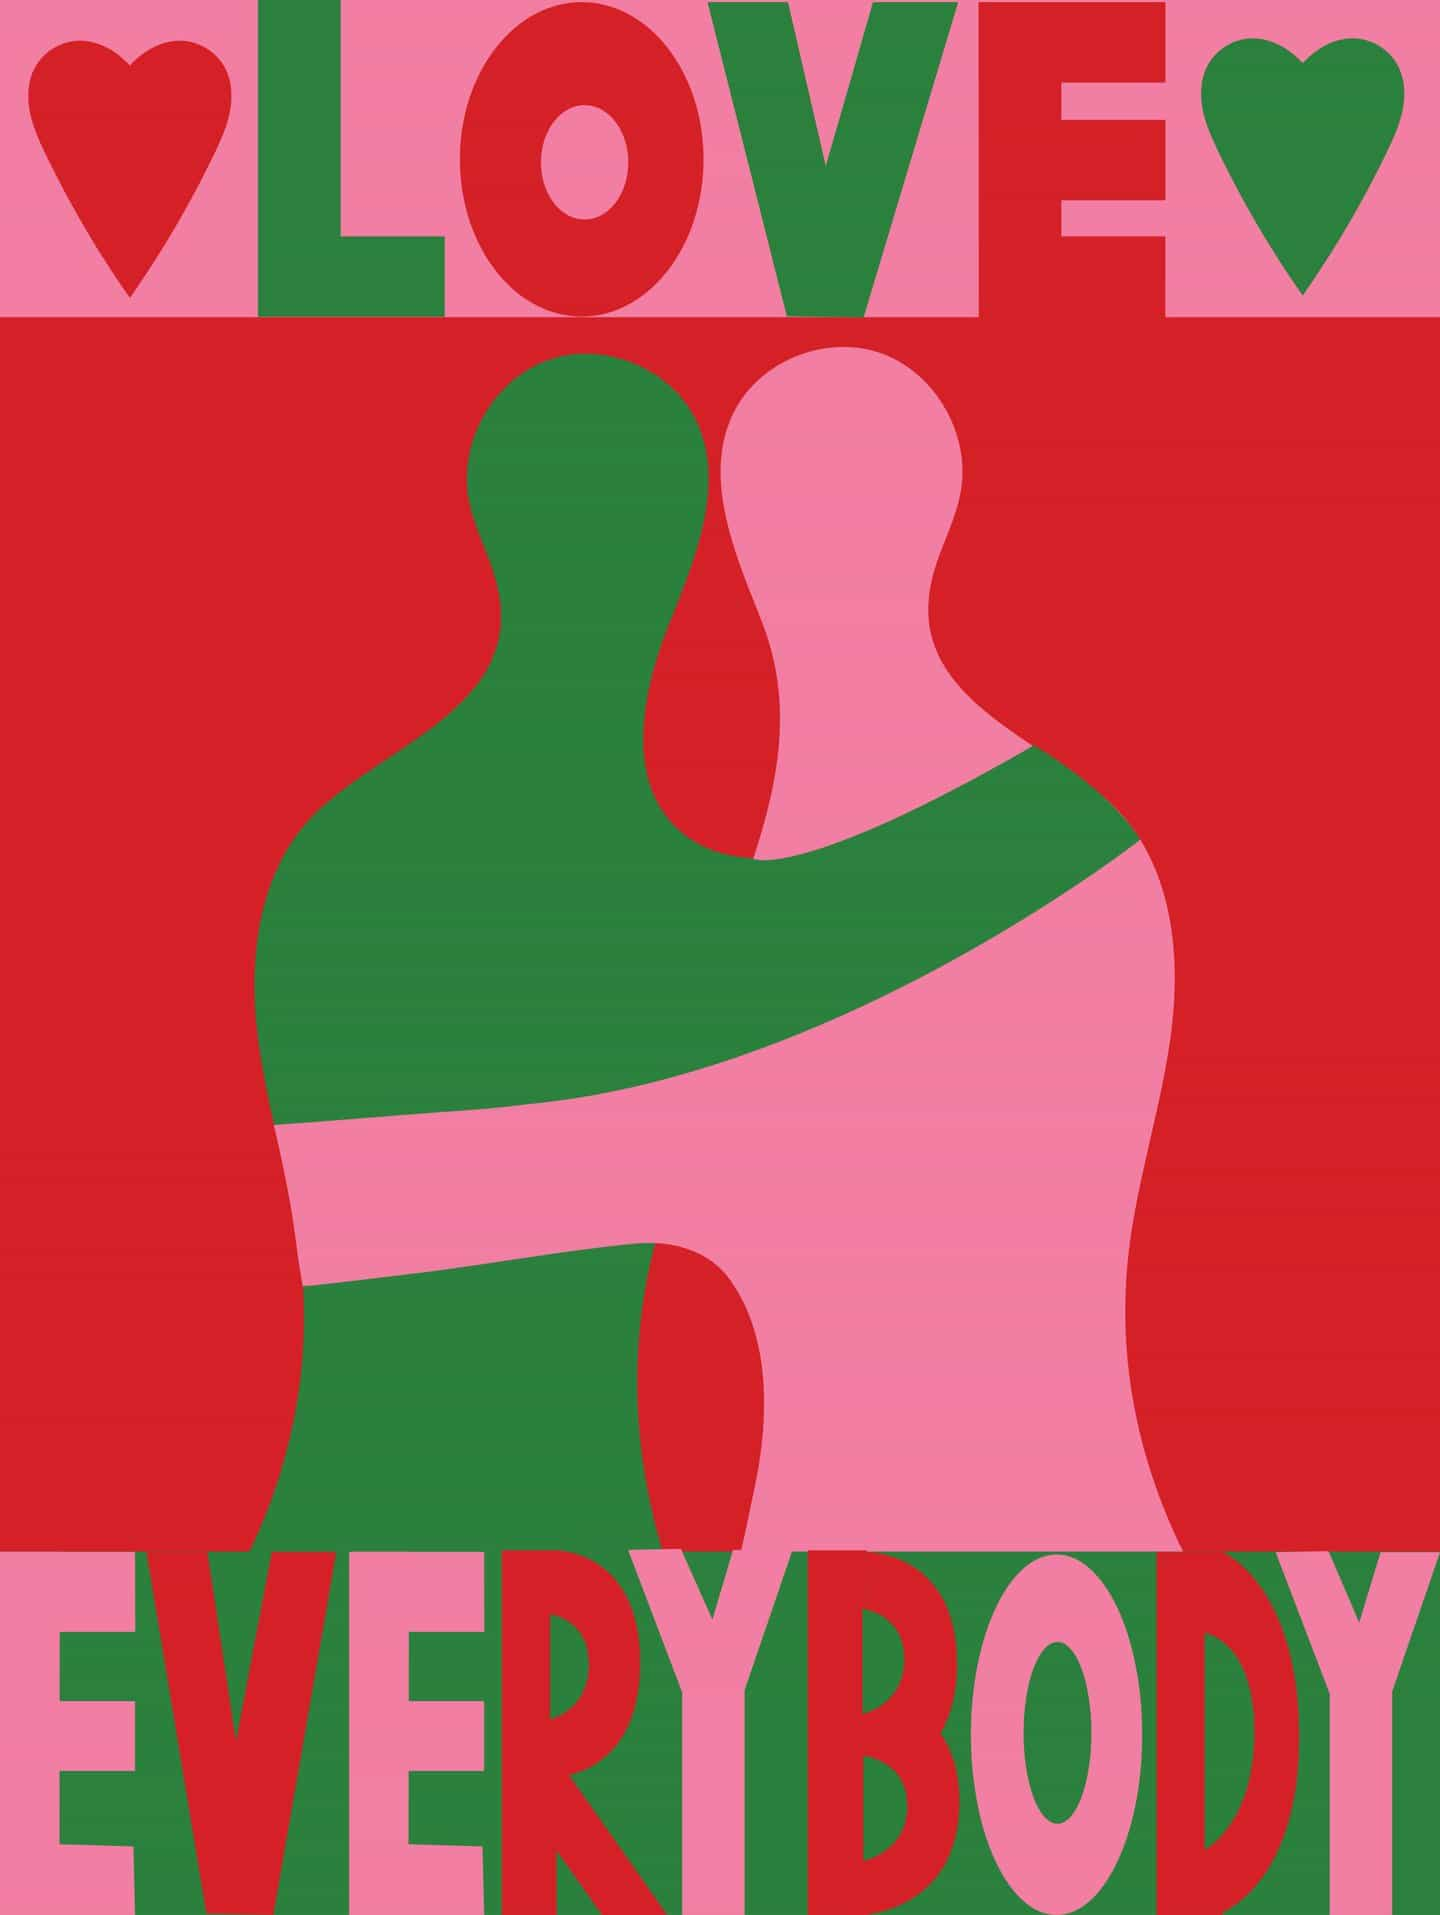 Olimpia Zagnoli: Todo el mundo ama